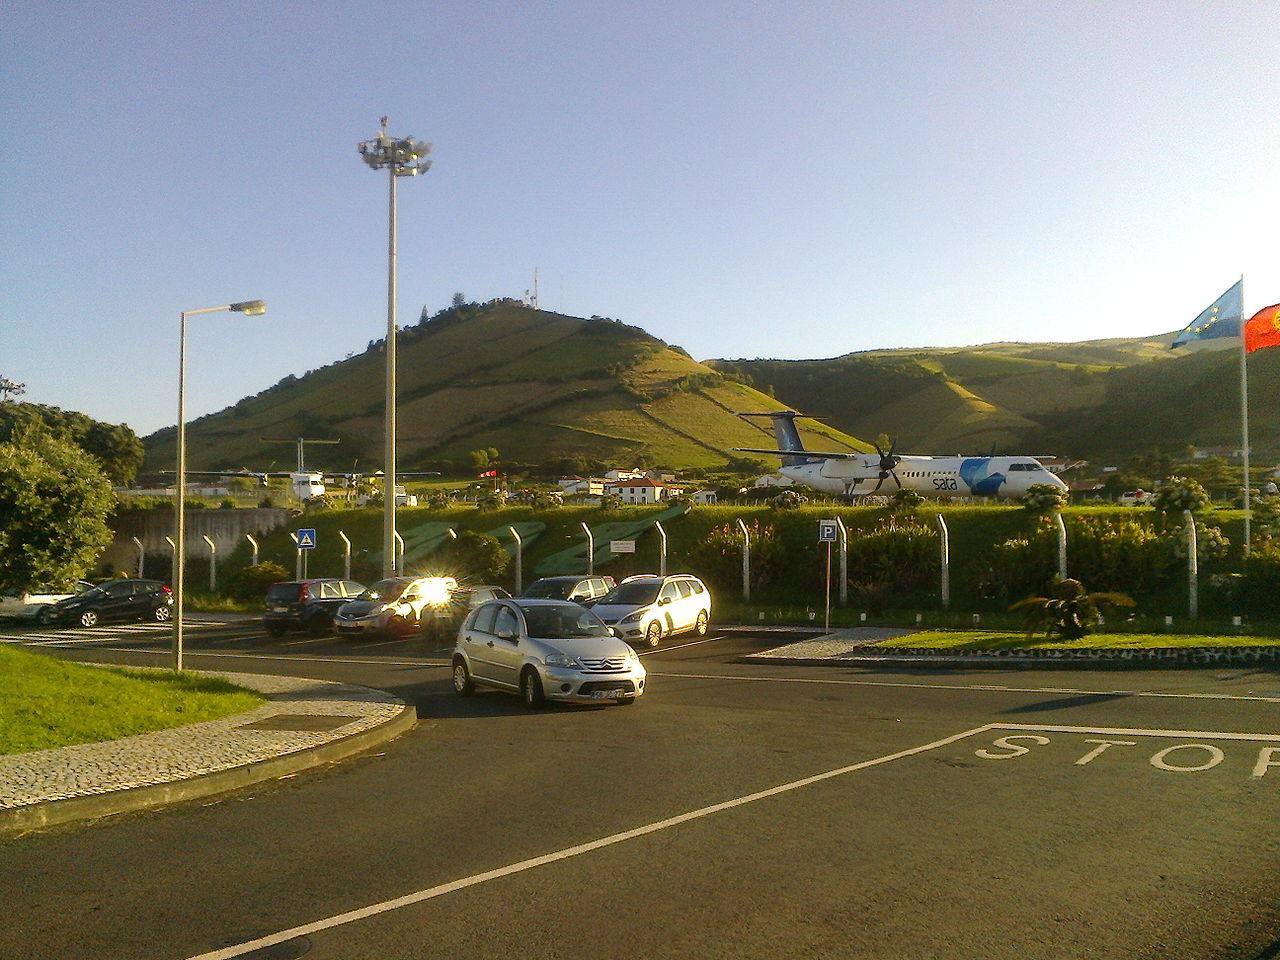 Aeroporto das Flores - Açores